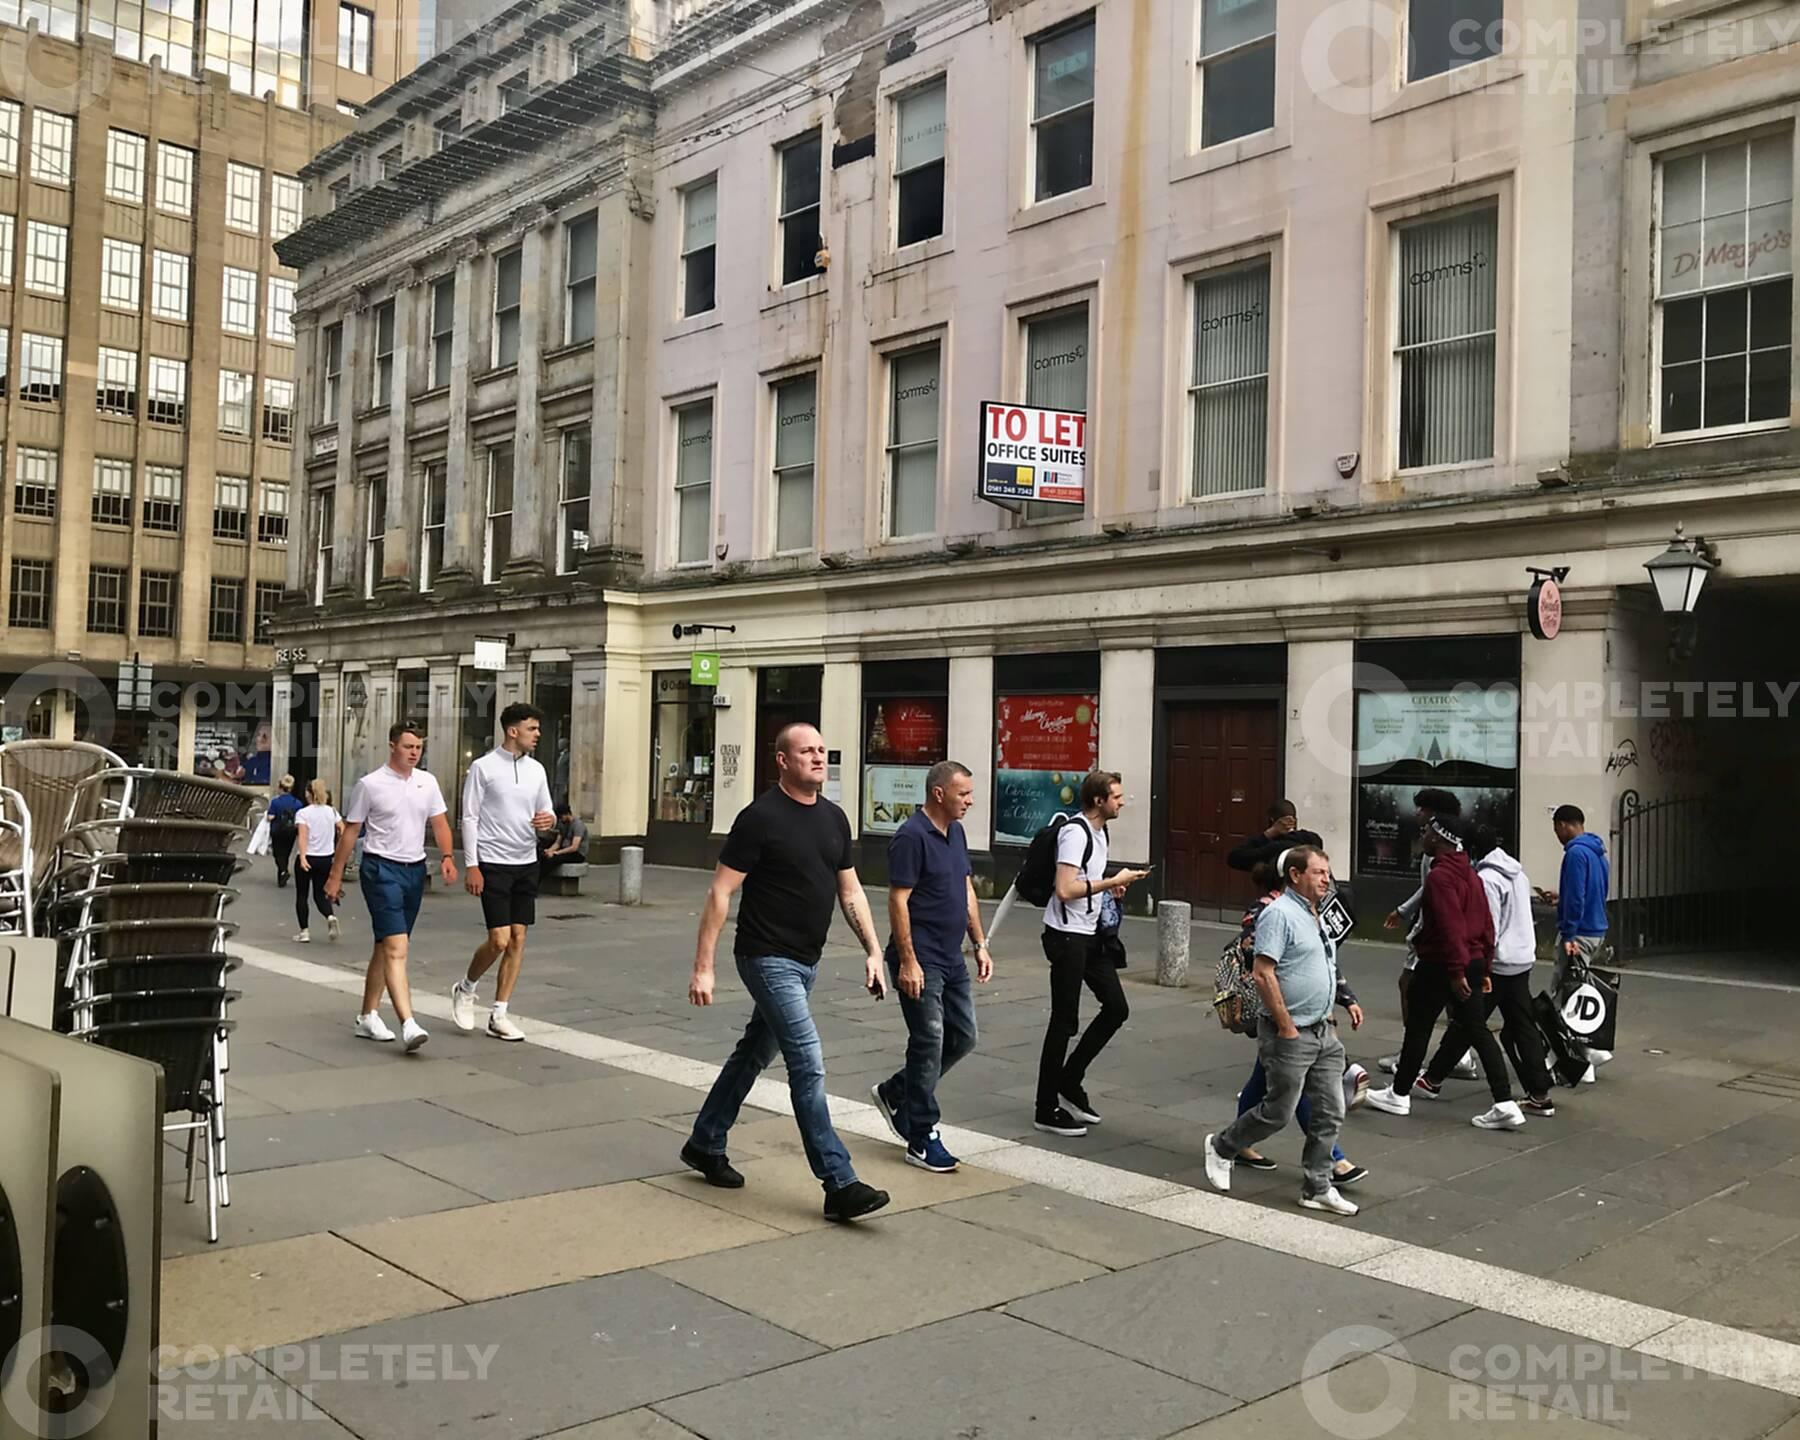 7 Royal Exchange Square